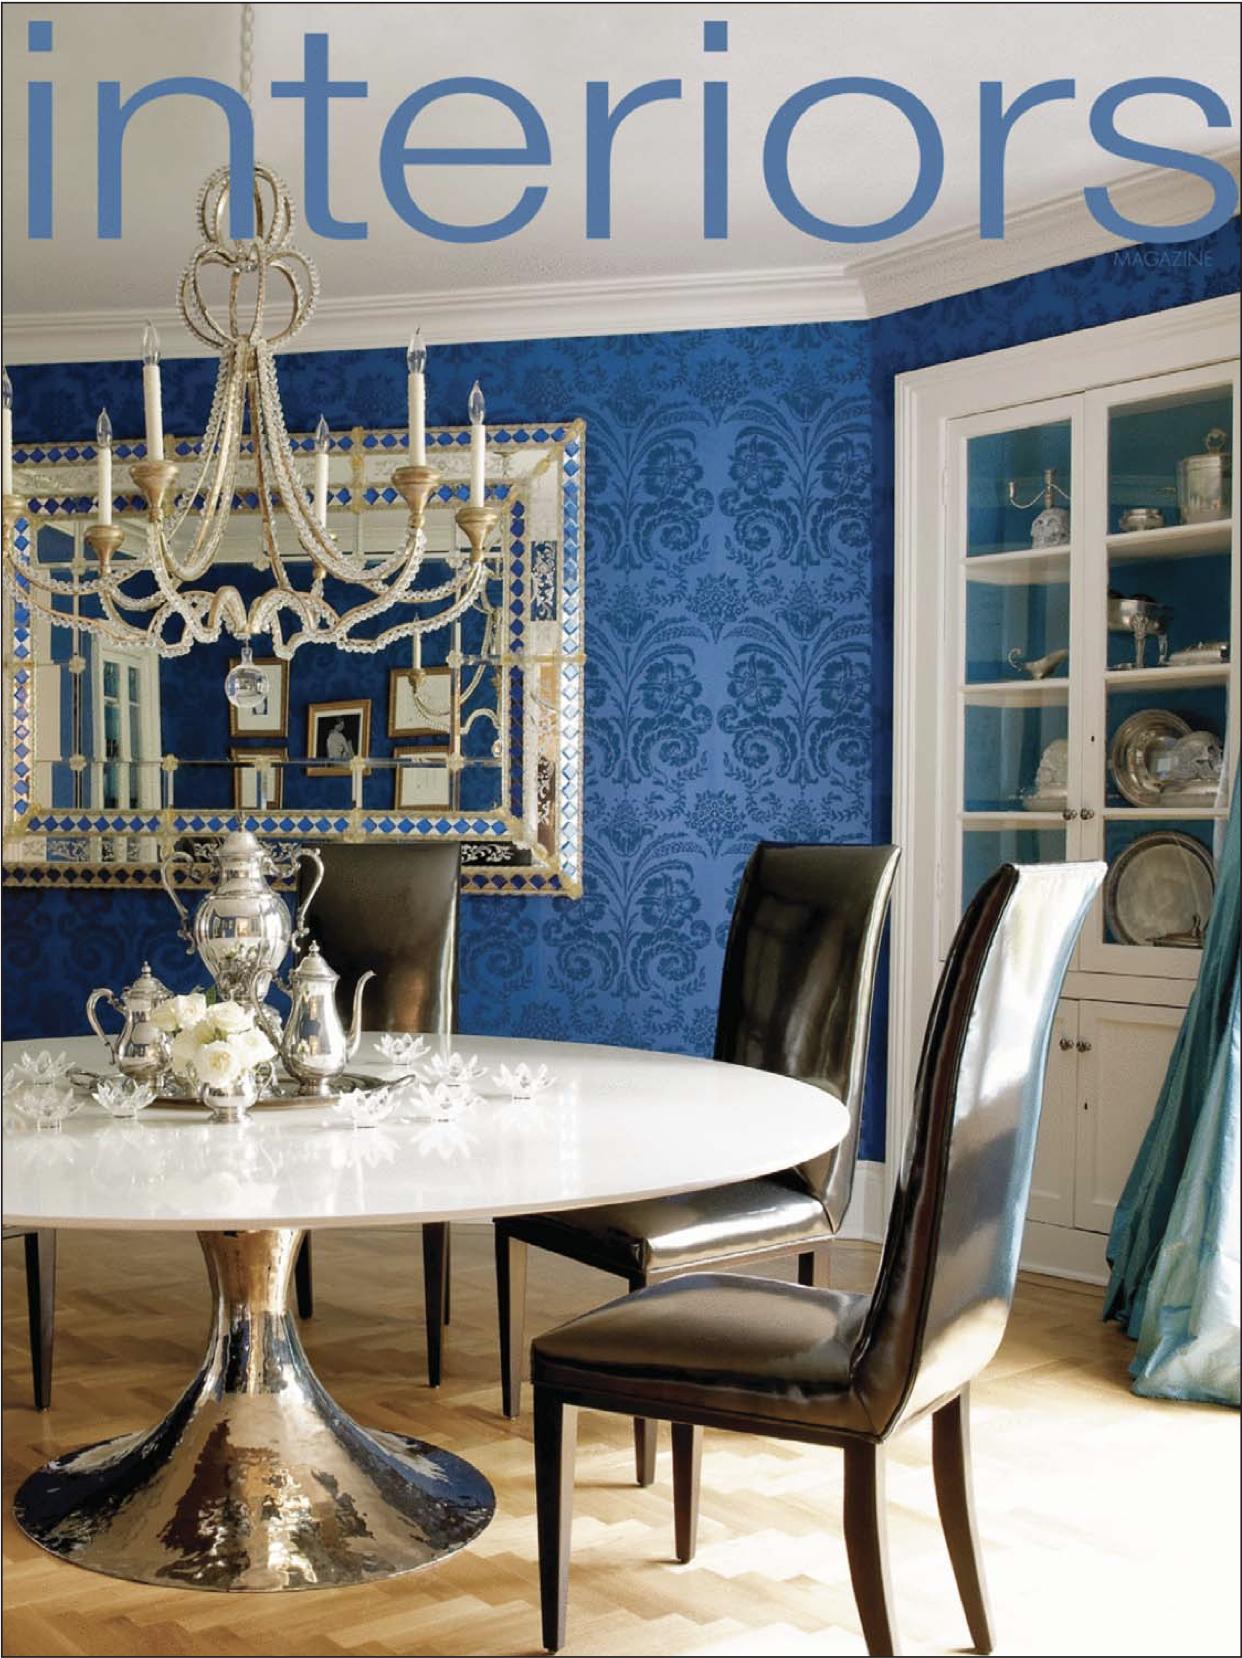 reeta-gyamlani-farrago-design-interiors mag cover april 2011